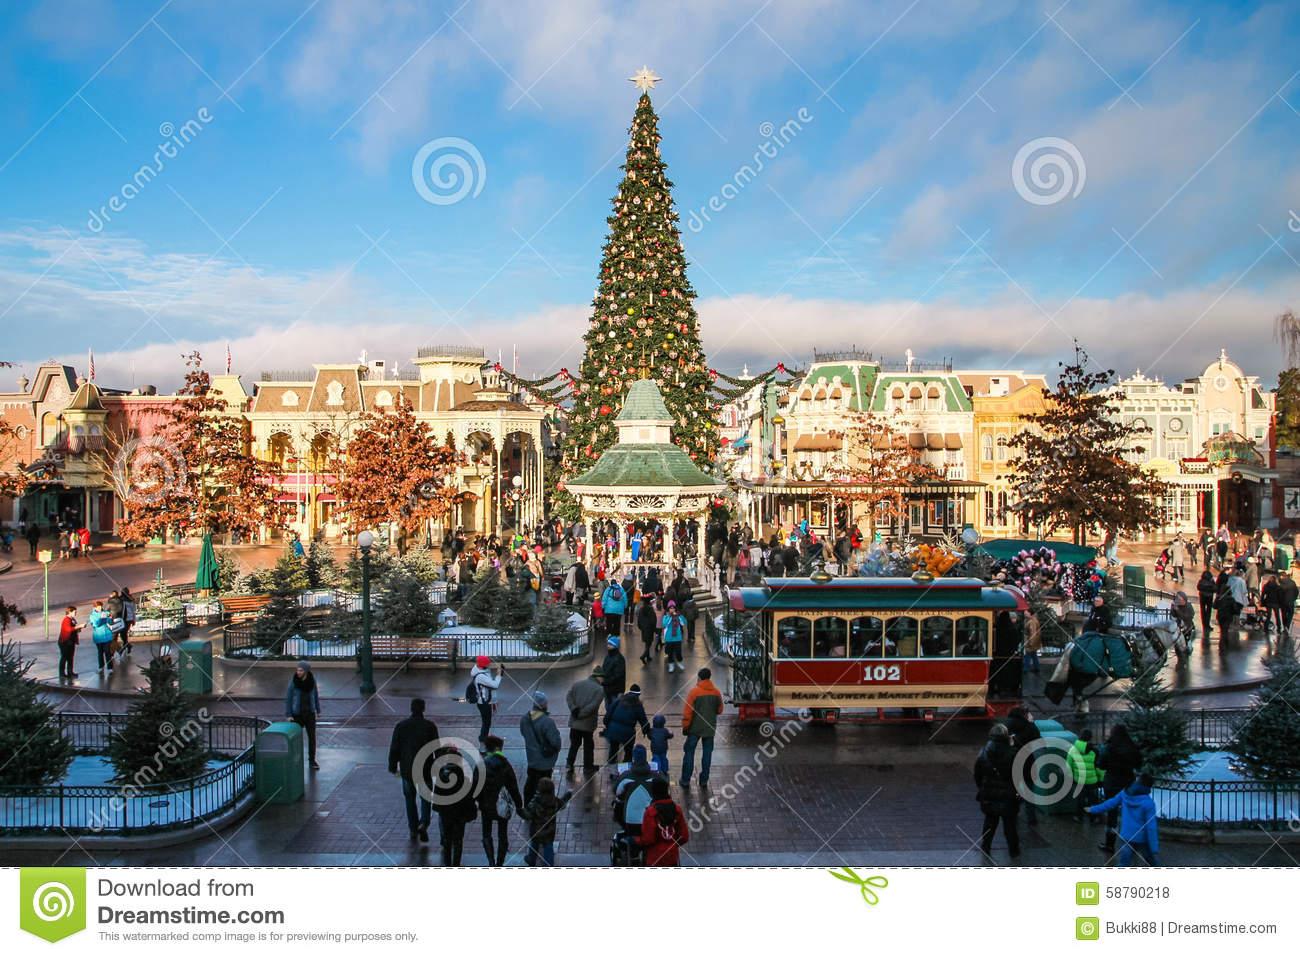 Disneyland Paris With Christmas Decorations Editorial Stock Photo.